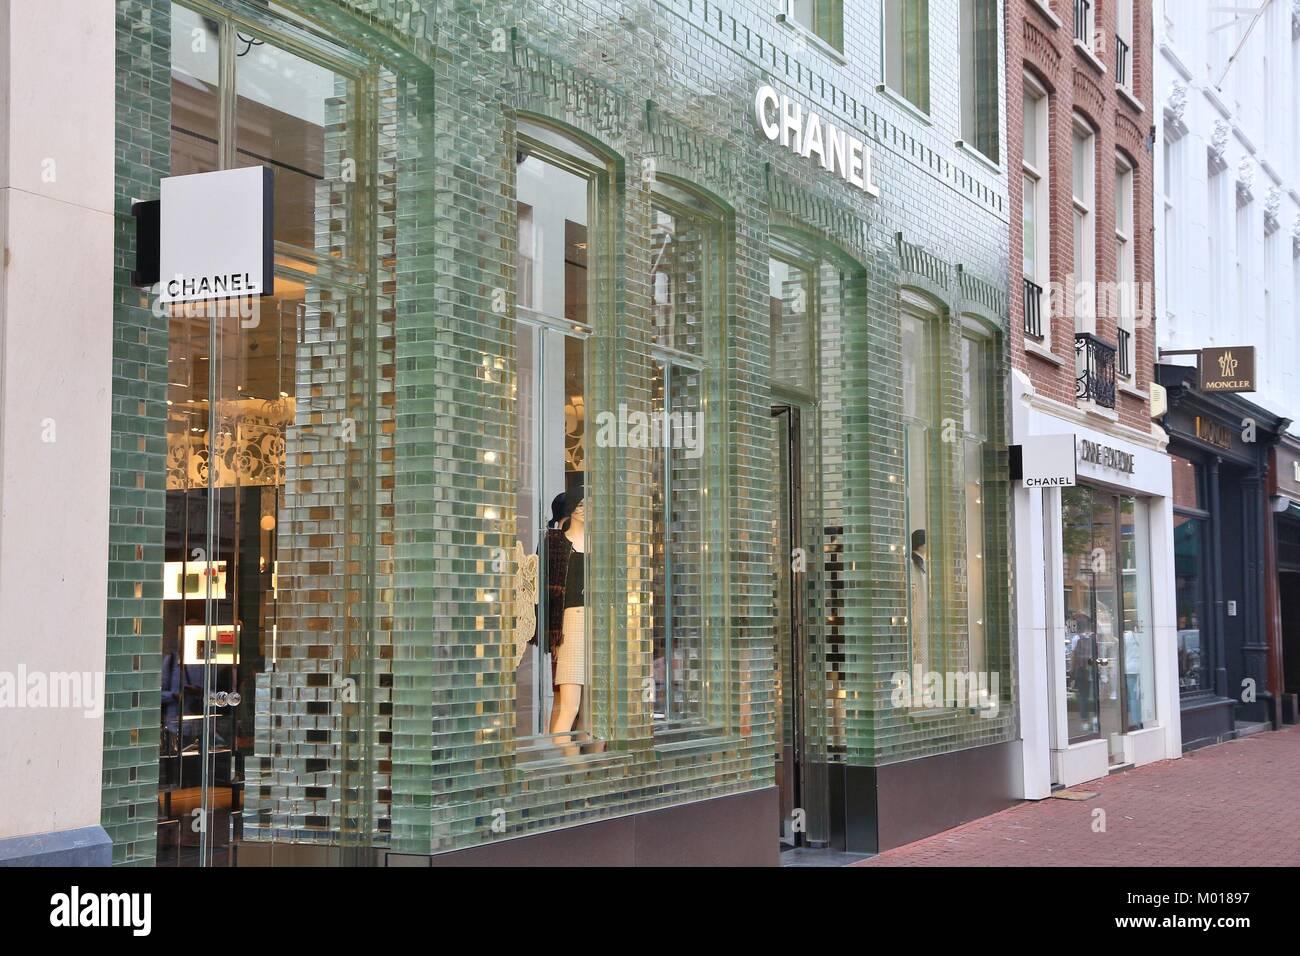 b0fda1c26c9 AMSTERDAM, NETHERLANDS - JULY 10, 2017: Chanel fashion shop at P.C ...